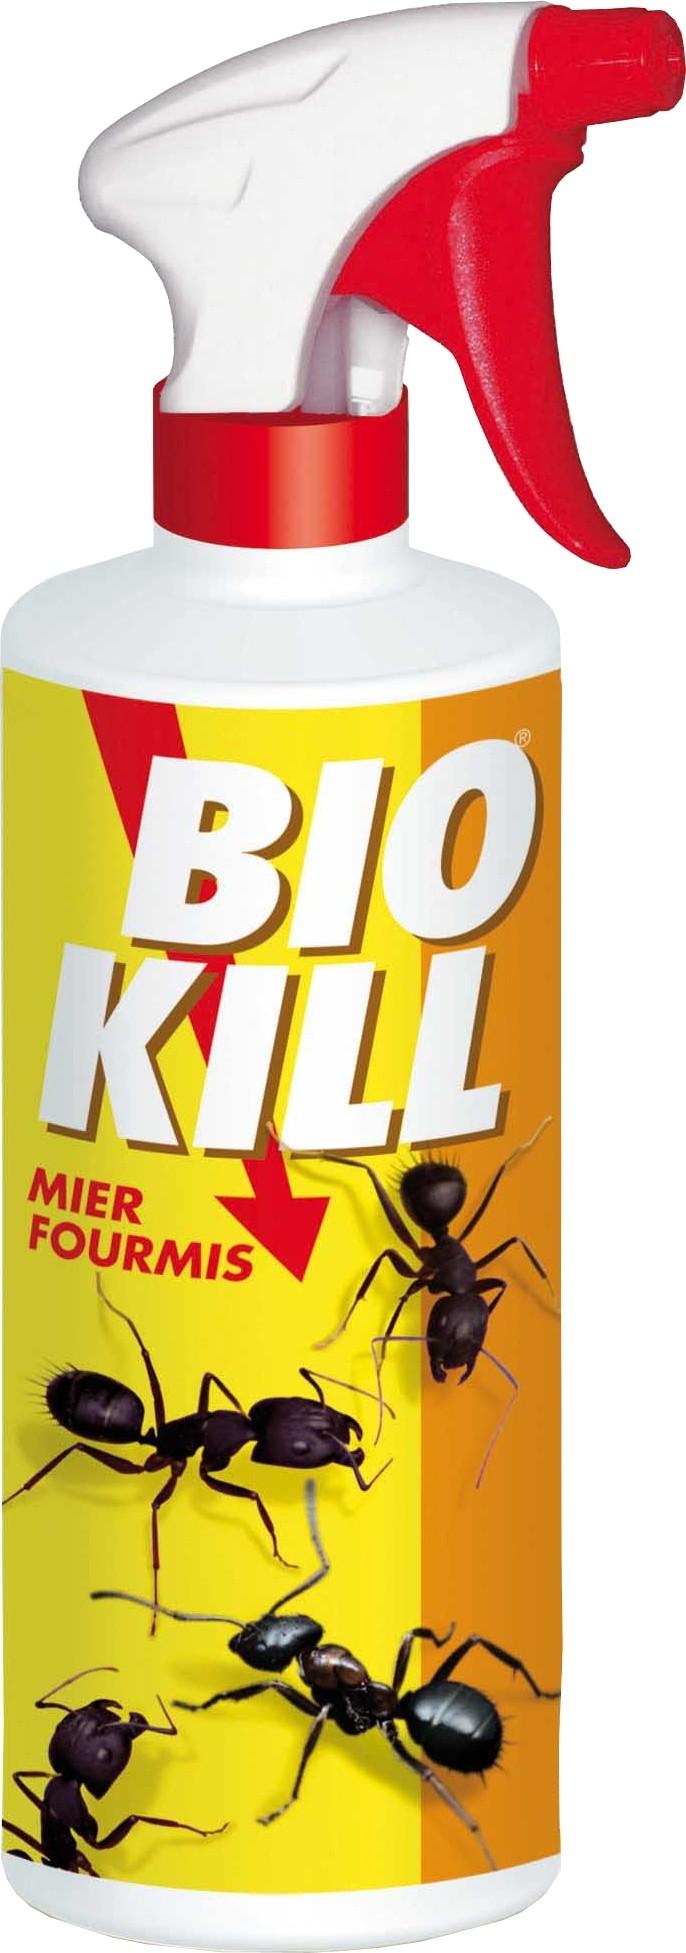 insecticide contre les fourmis bio kill bsi